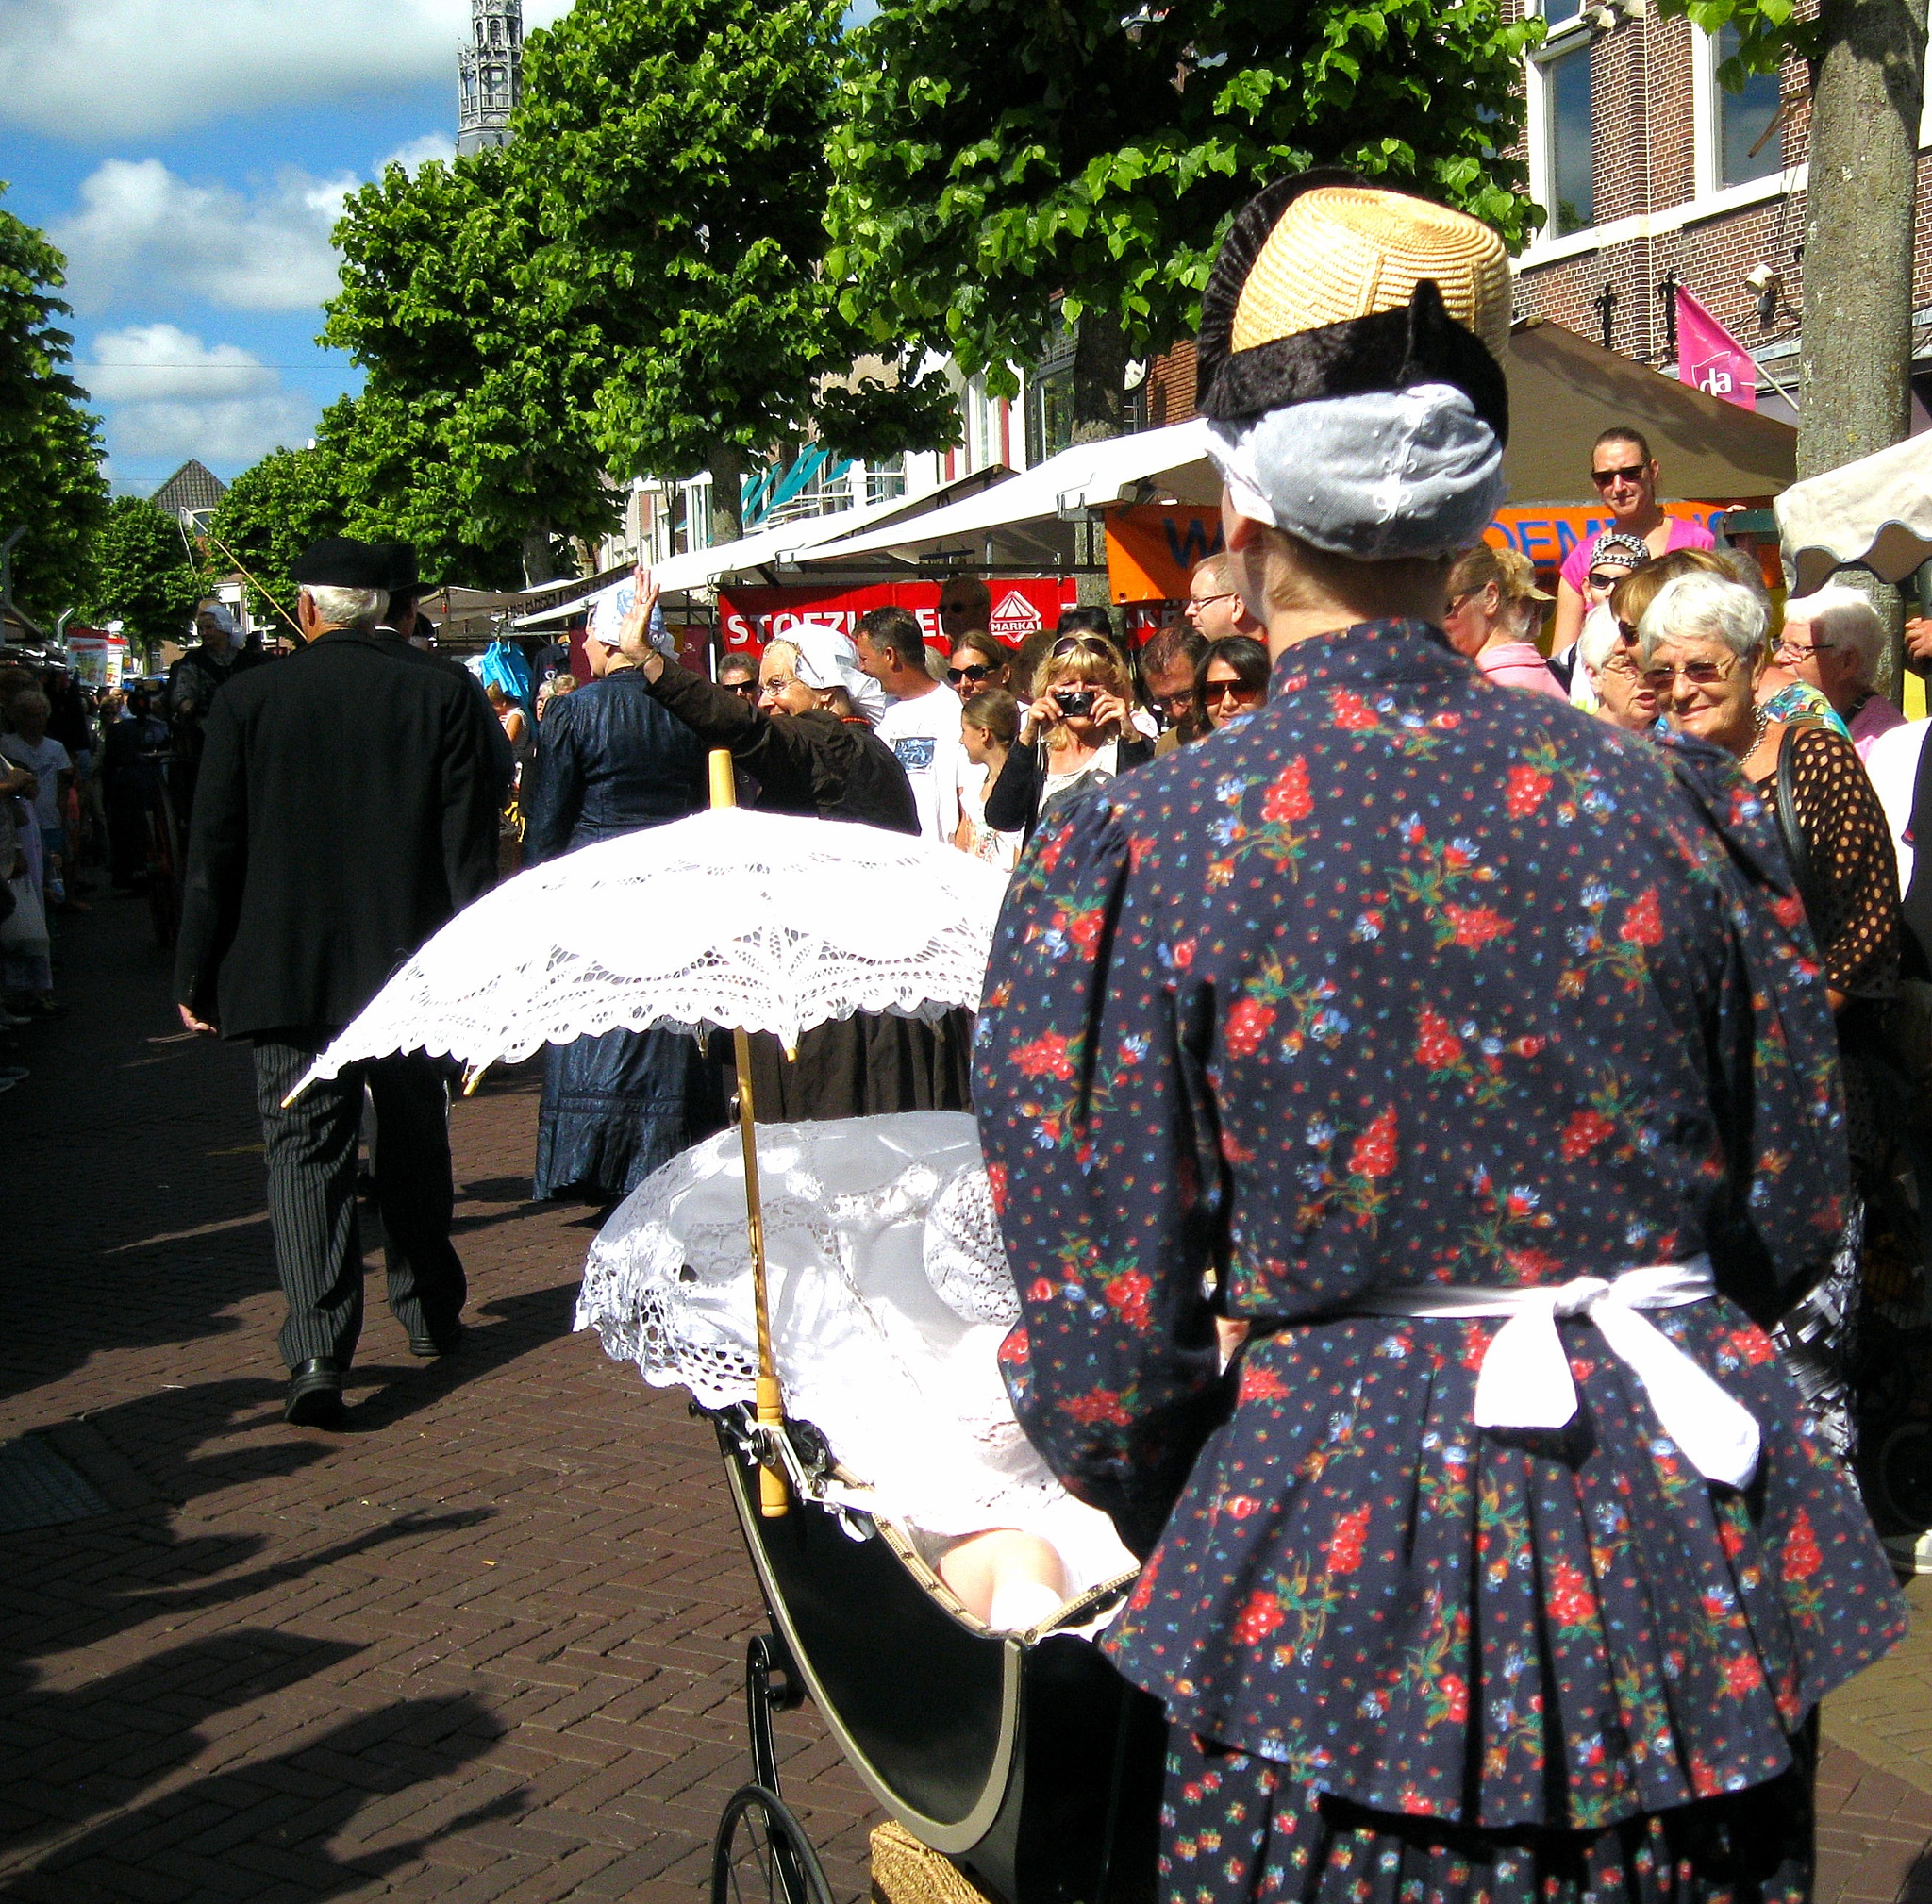 West-Friese market_ Hoorn _ Holland by Bob66